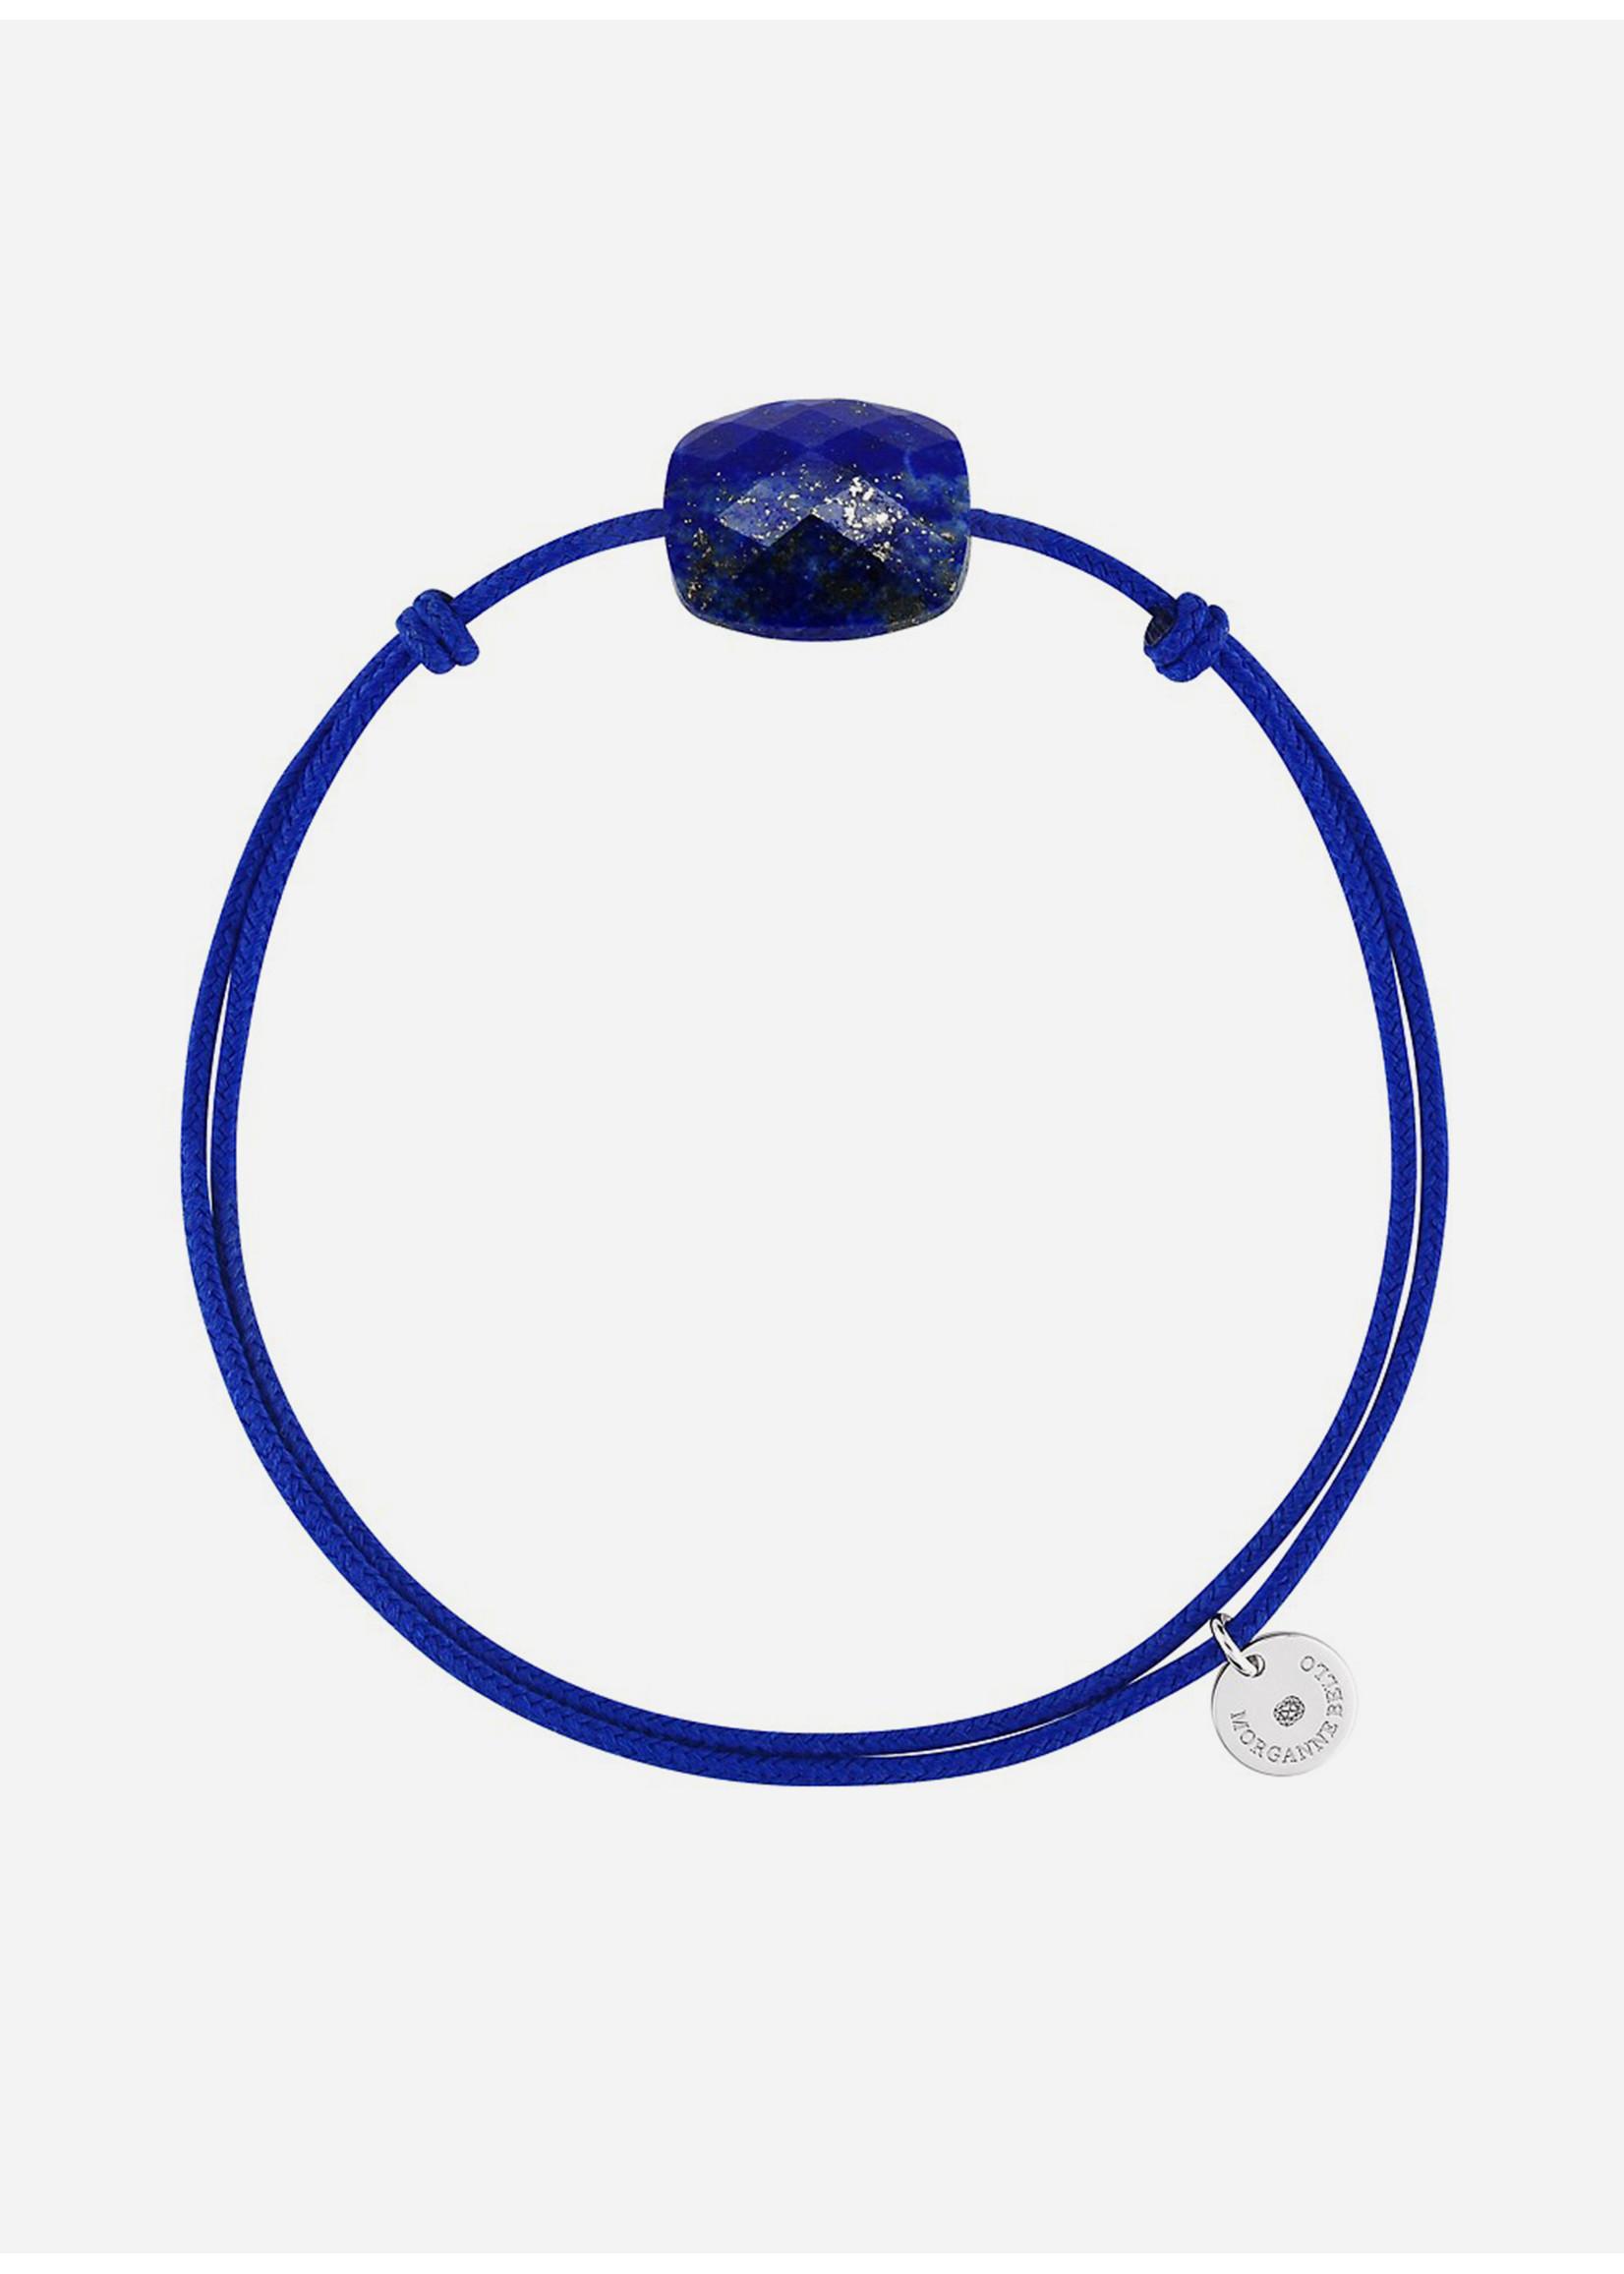 Morganne Bello Cushion lapis lazuli bracelet